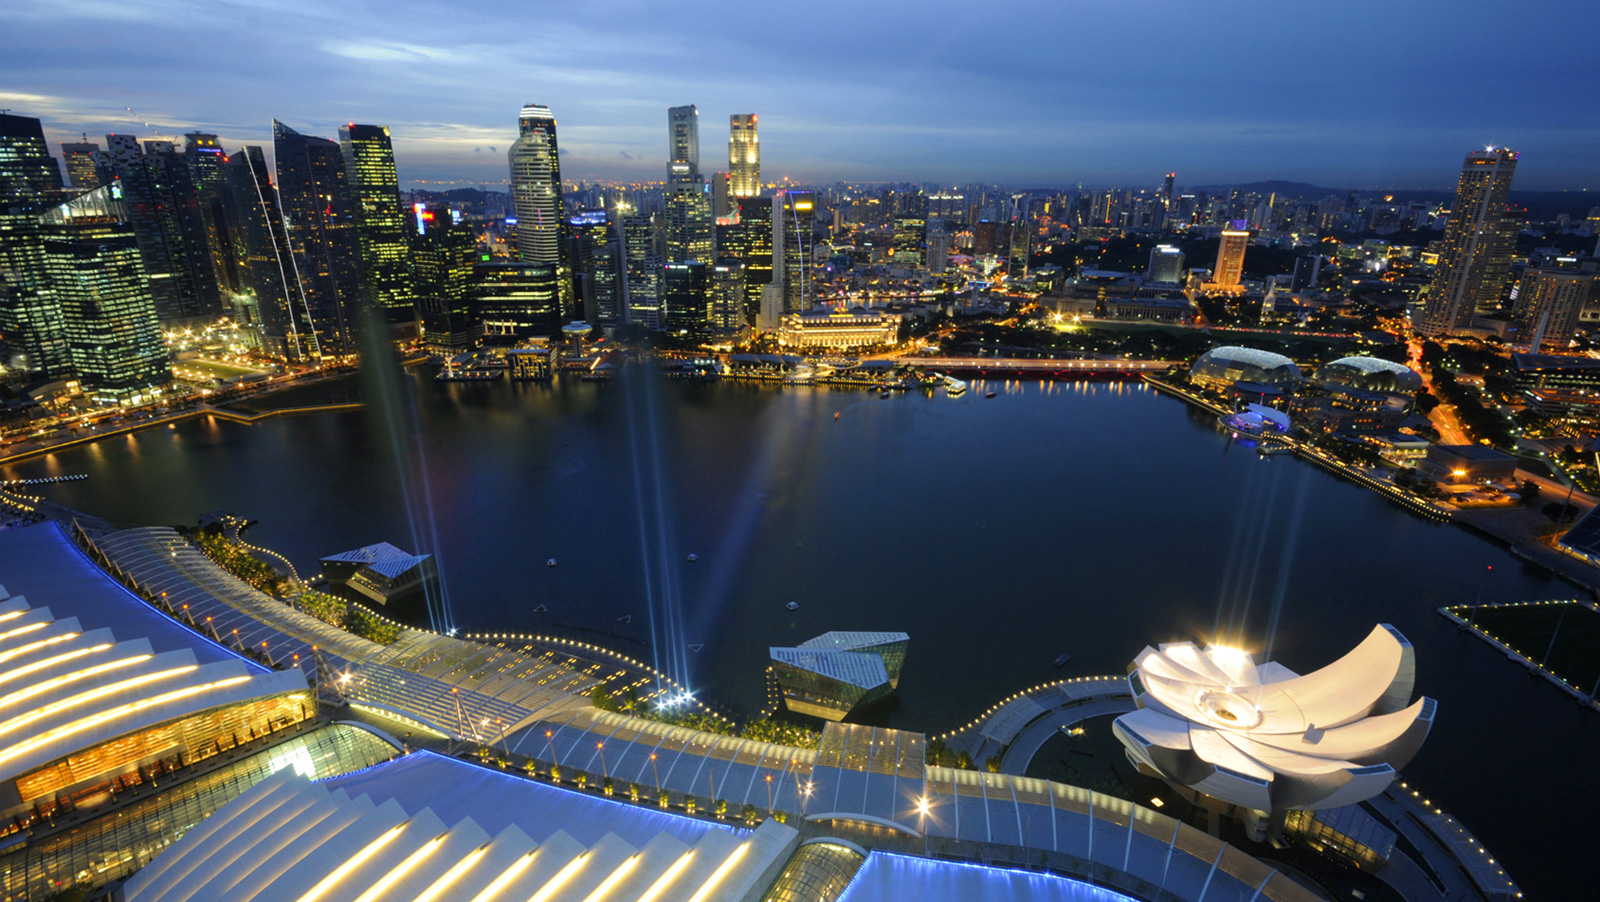 Las Vegas Sands picks up billions in loans for Singapore expansion